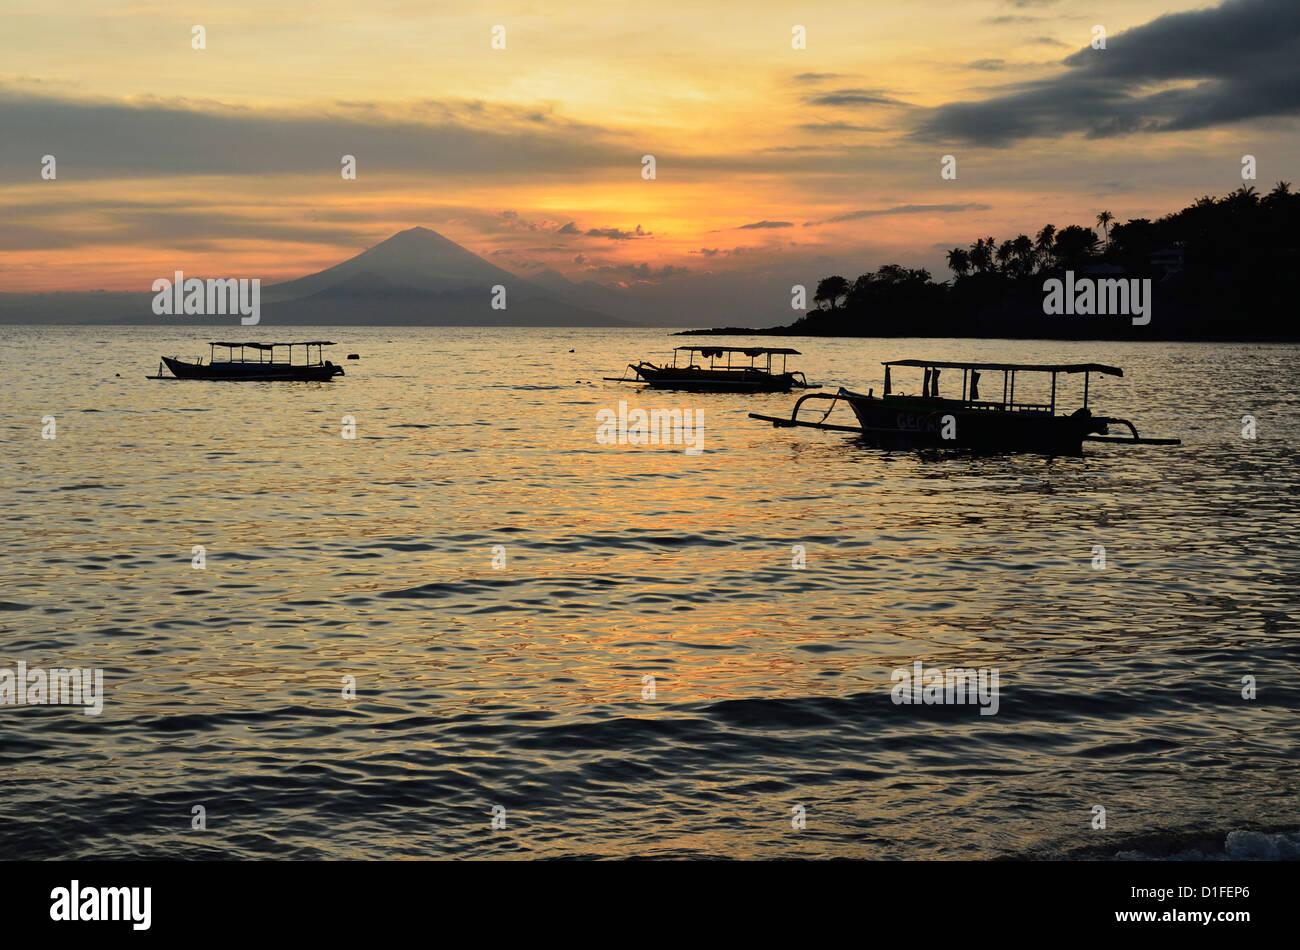 Sunset at Senggigi Beach, with Bali's Gunung Agung in the background, Senggigi, Lombok, Indonesia, Southeast - Stock Image